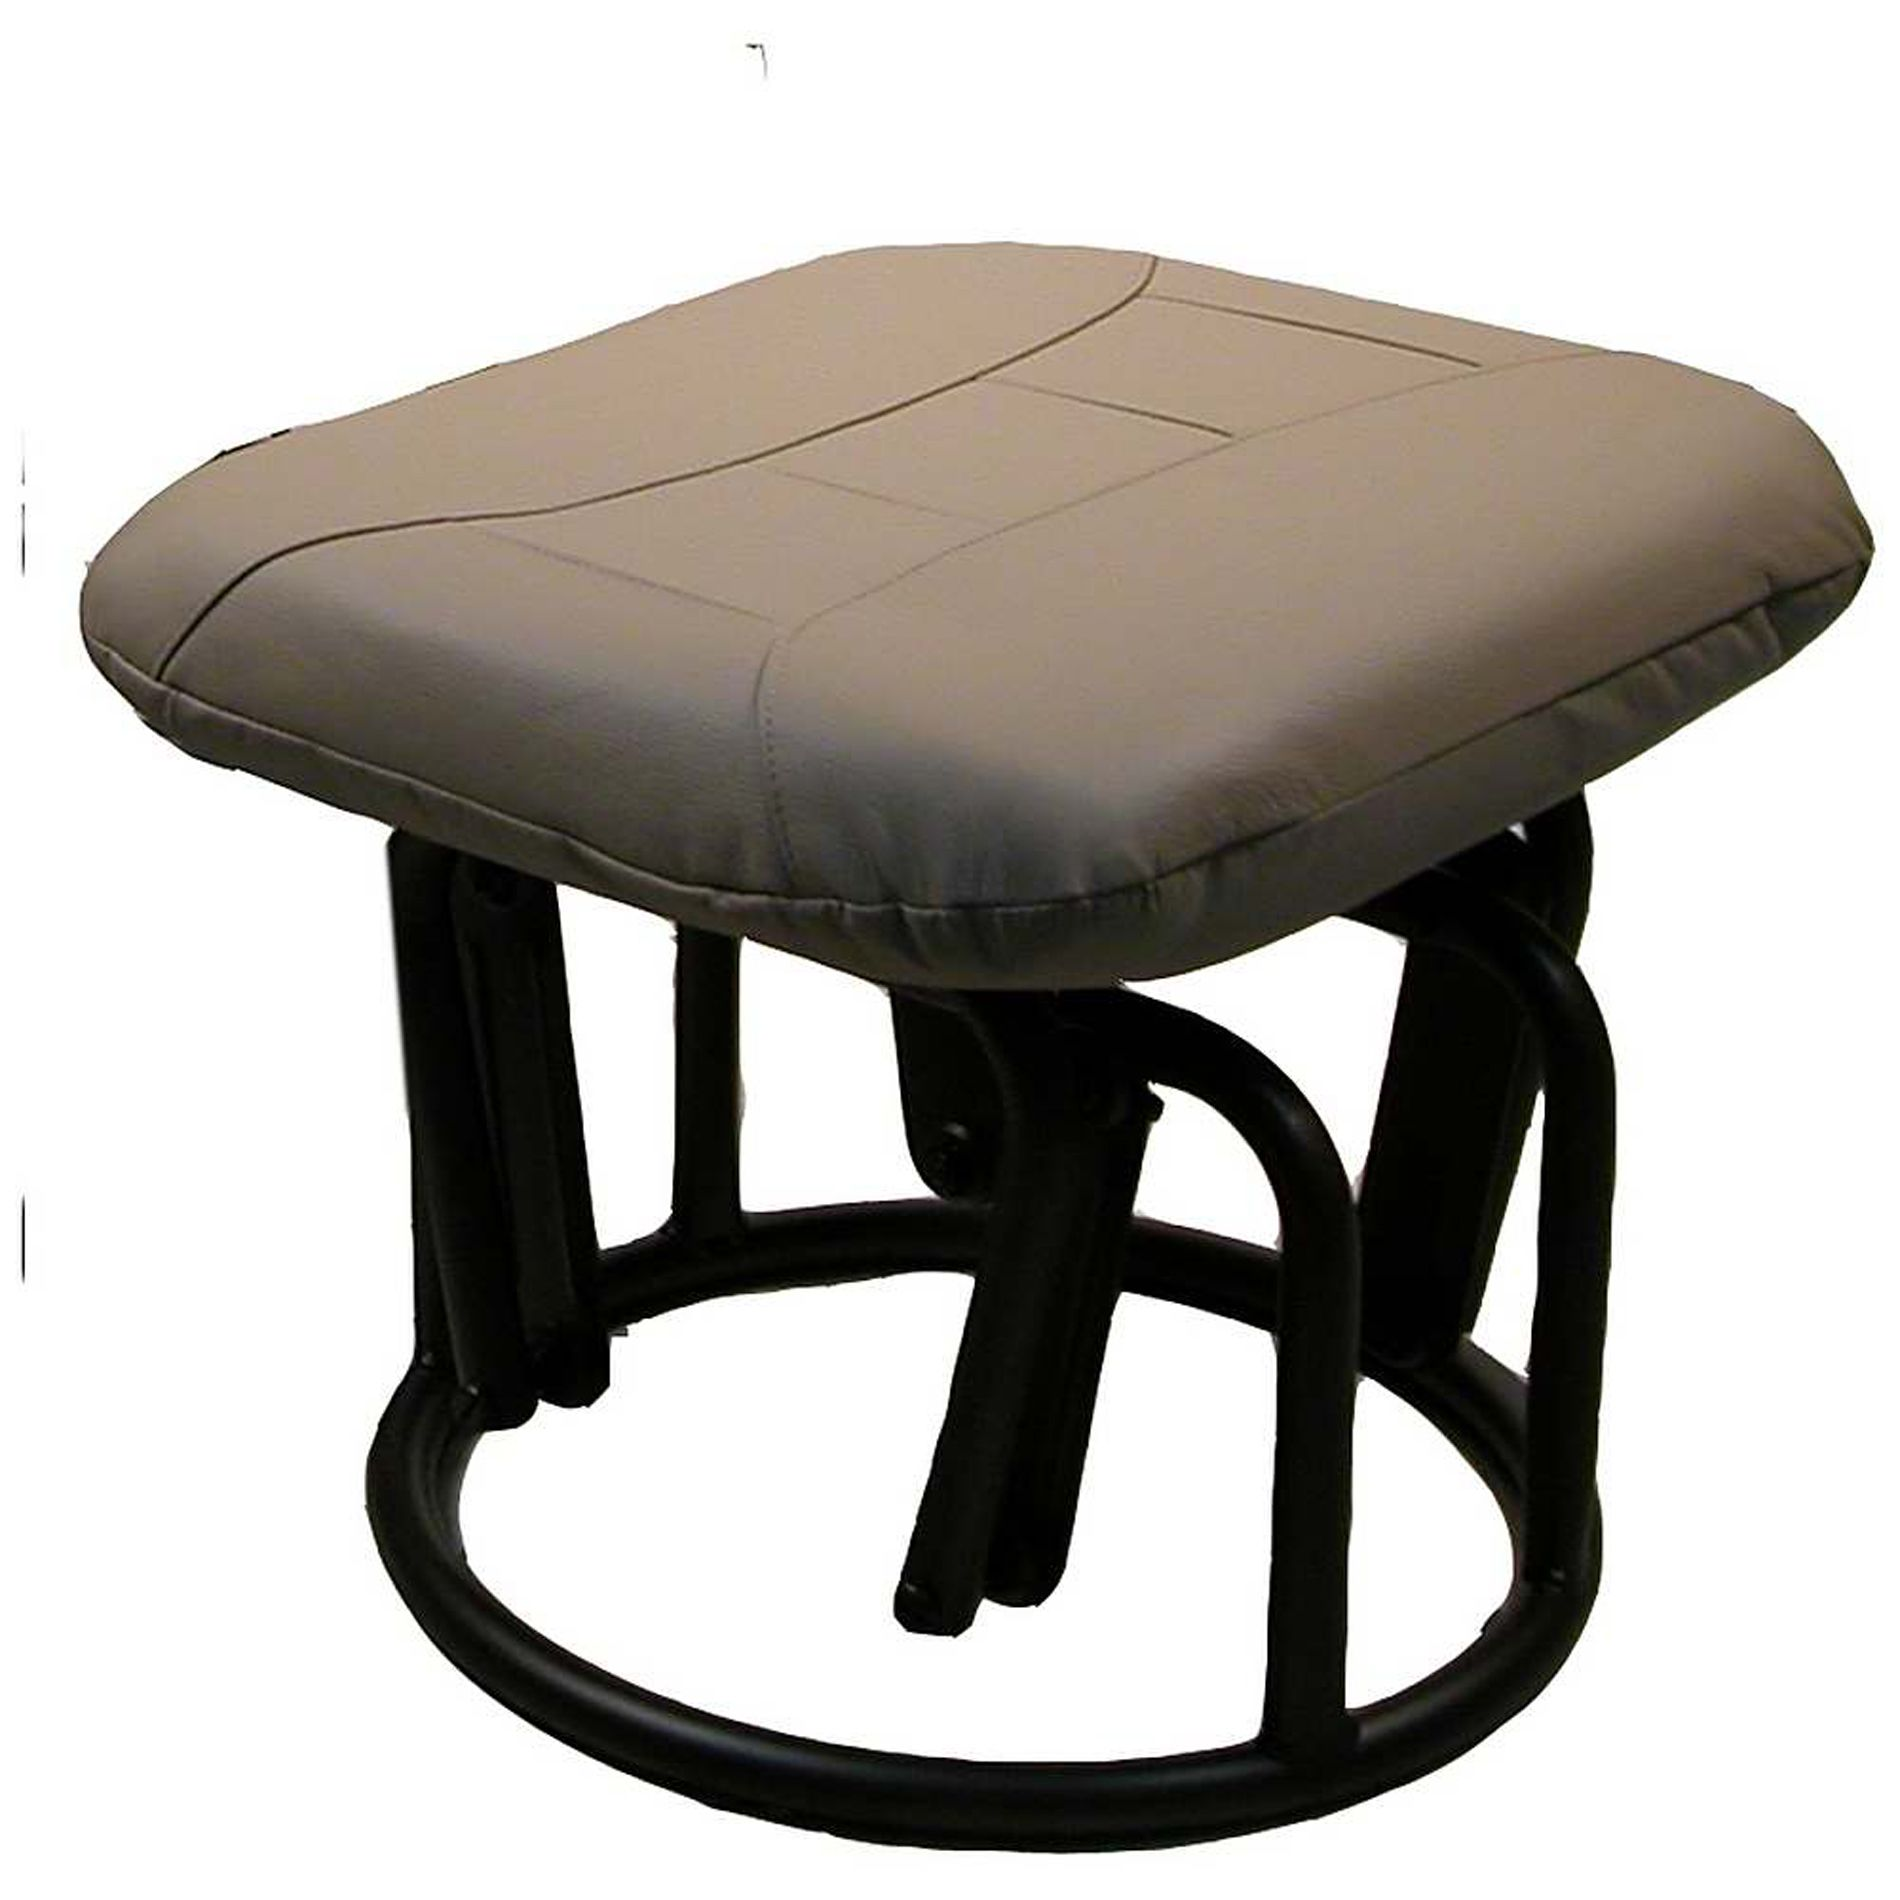 glider chair and ottoman canada wheelchair shower demare gliders rocker leather match cobblestone